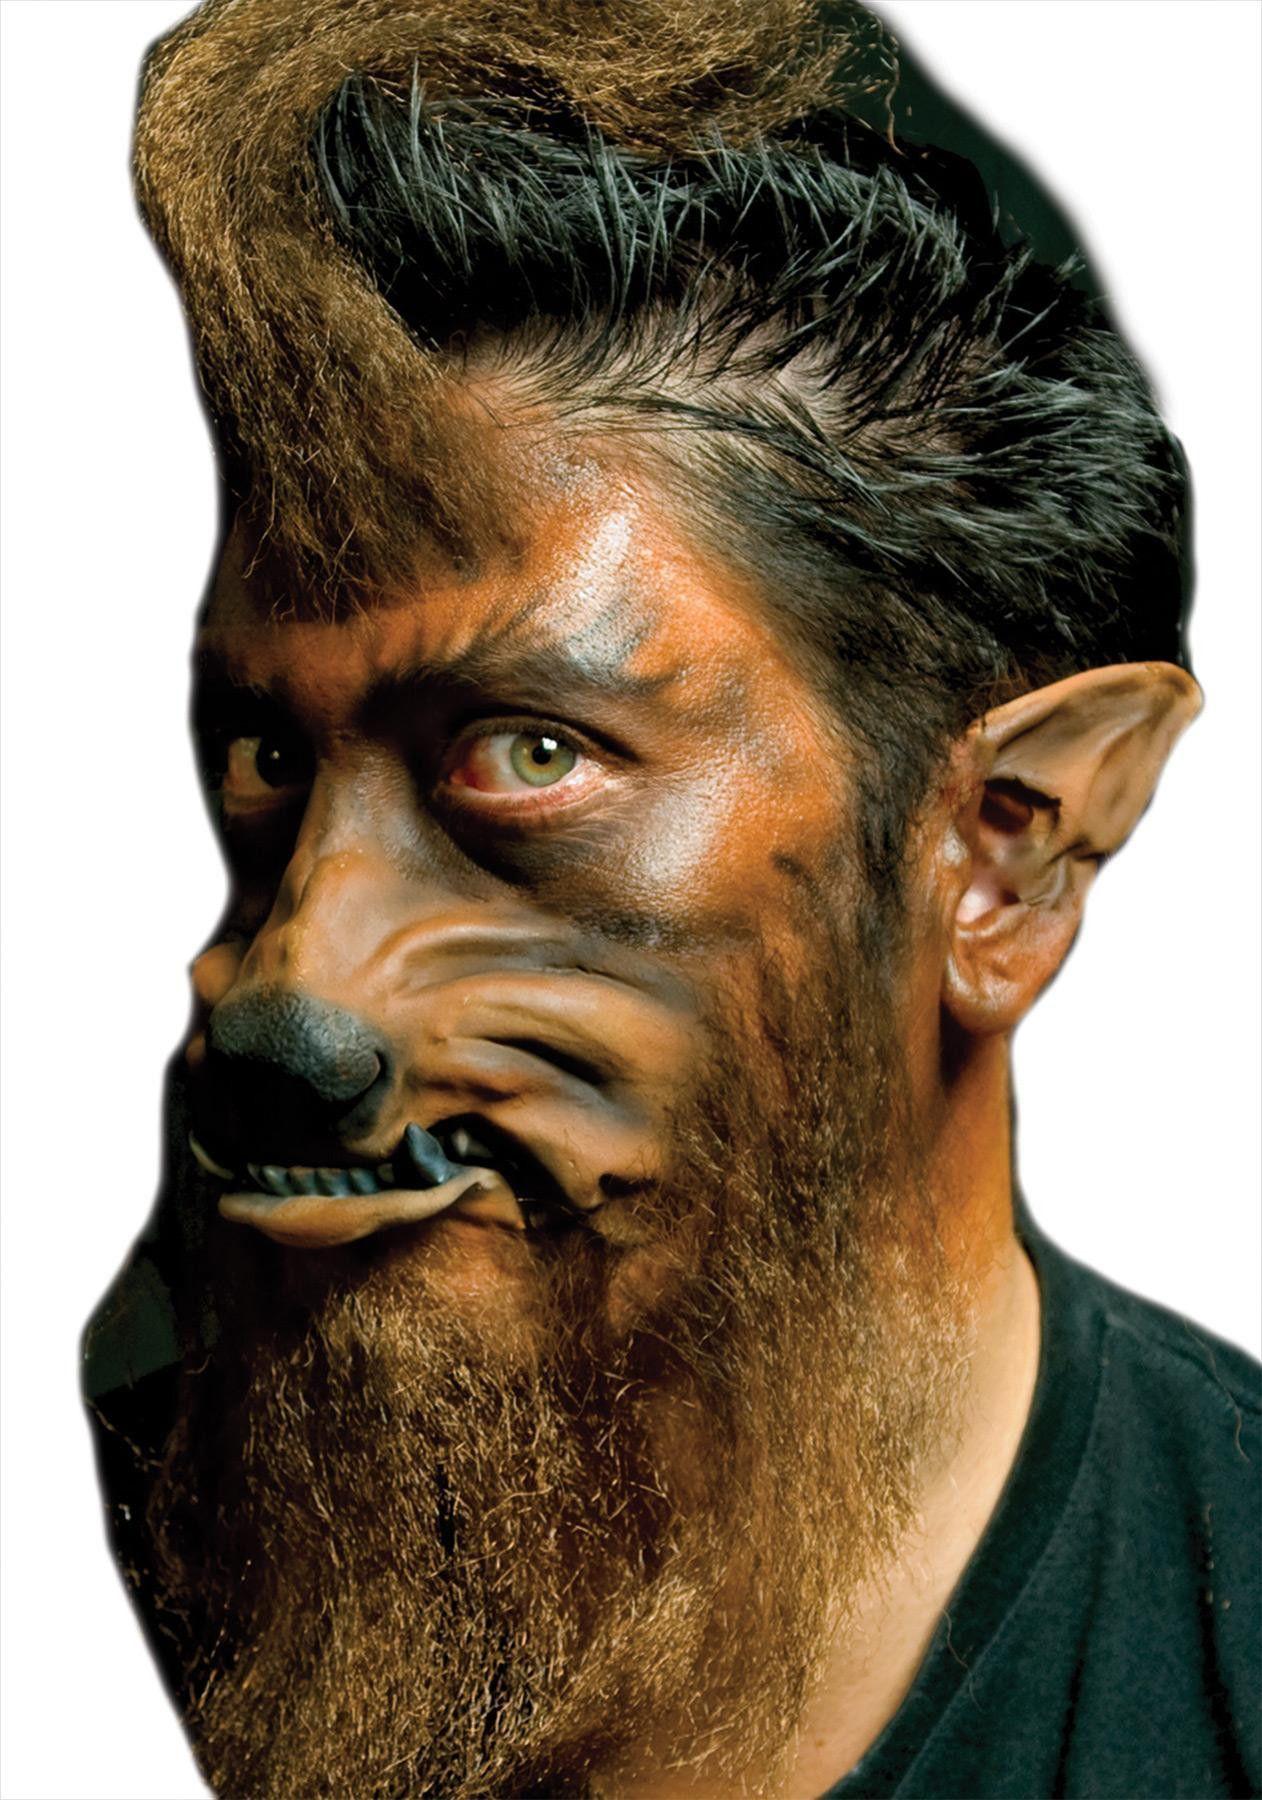 c2b29bd0cee Werewolf Ears Woochie